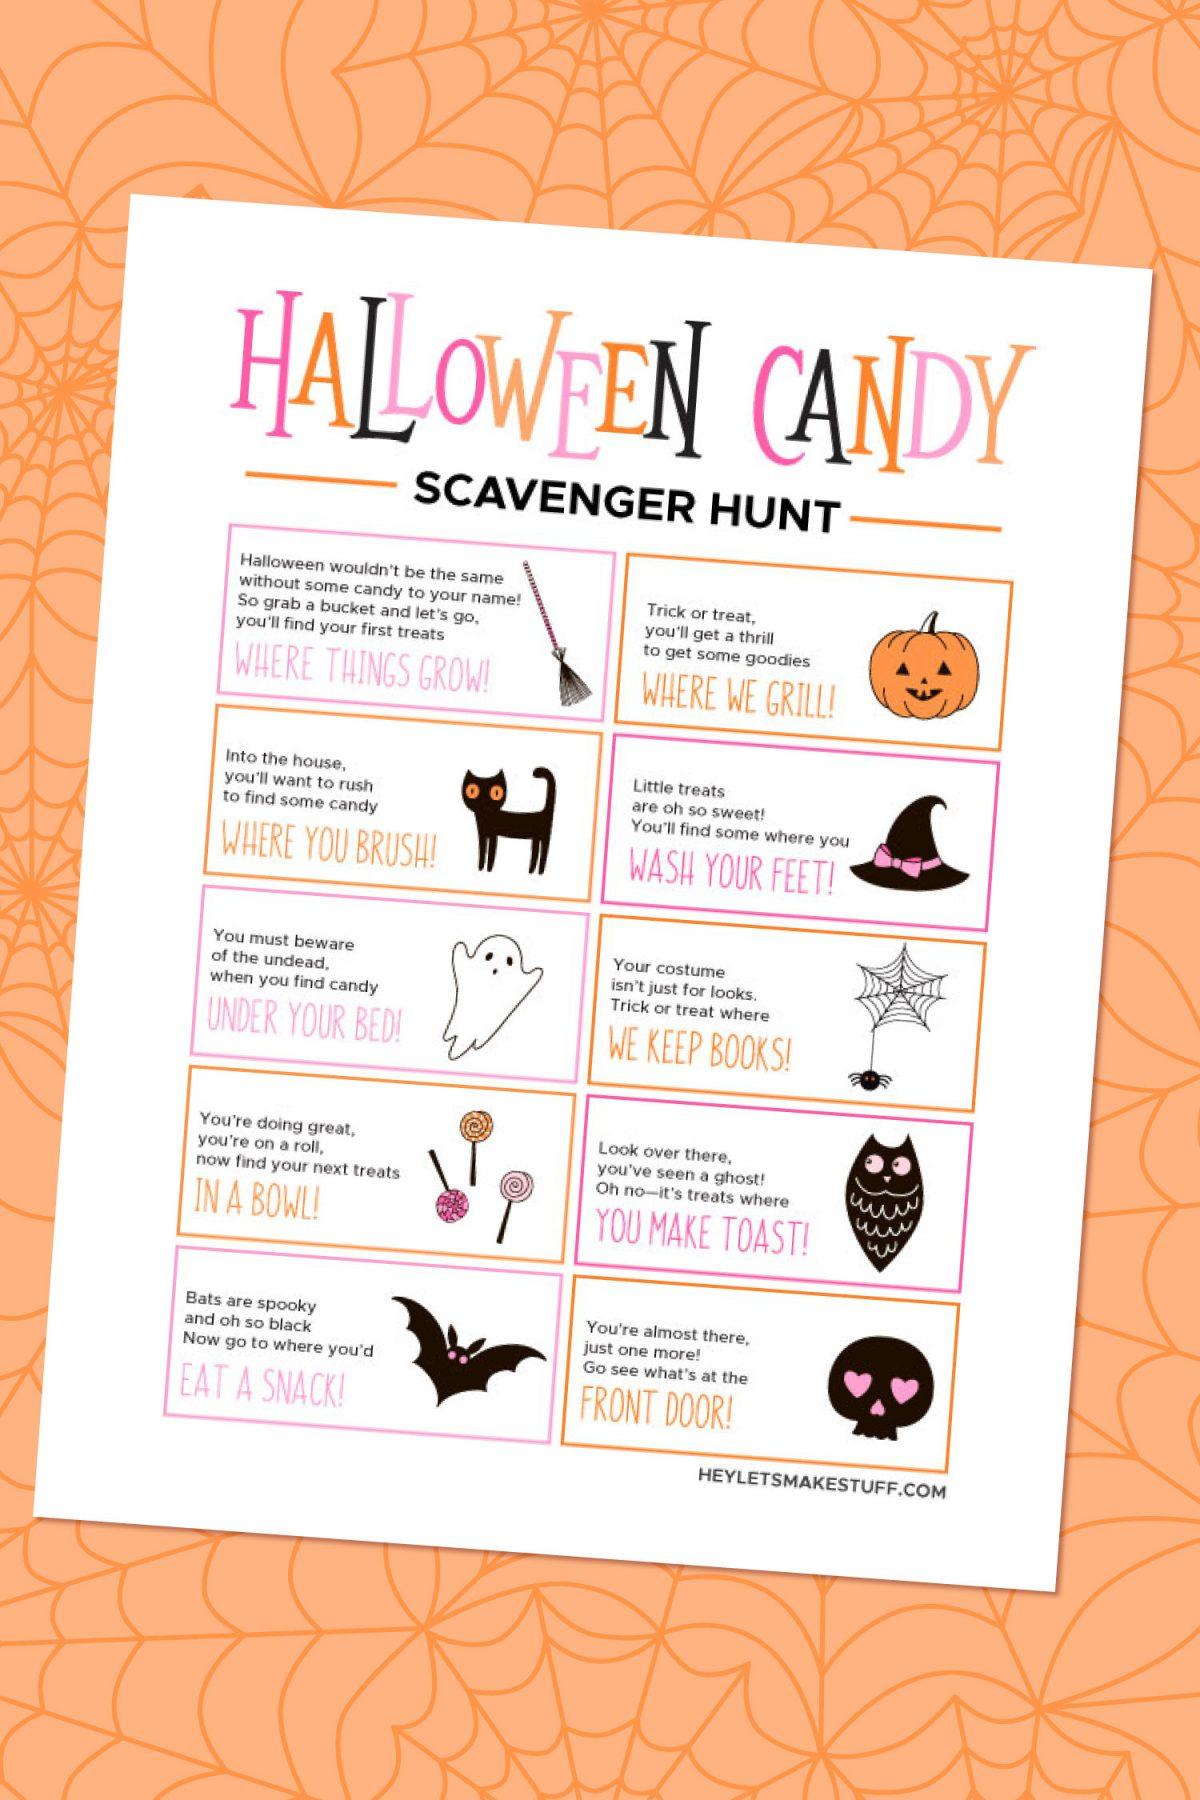 Halloween Candy Scavenger Hunt on Orange Background